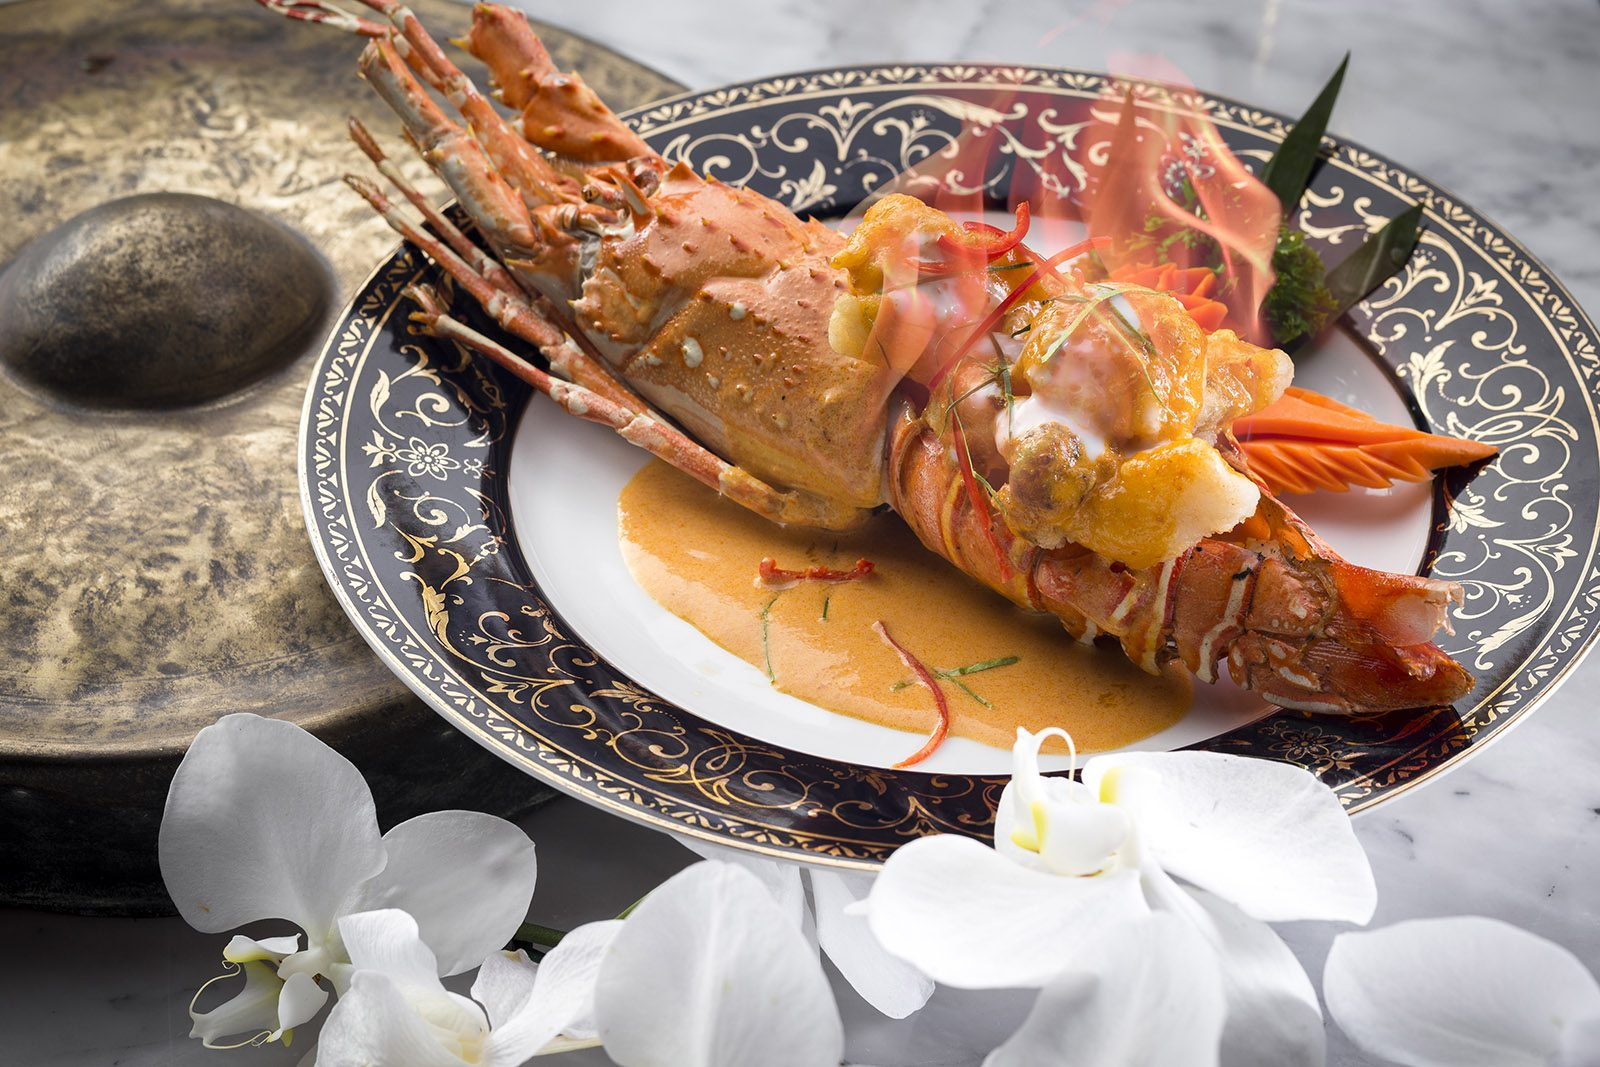 dusit thani laguna phuket - Ruen Thai